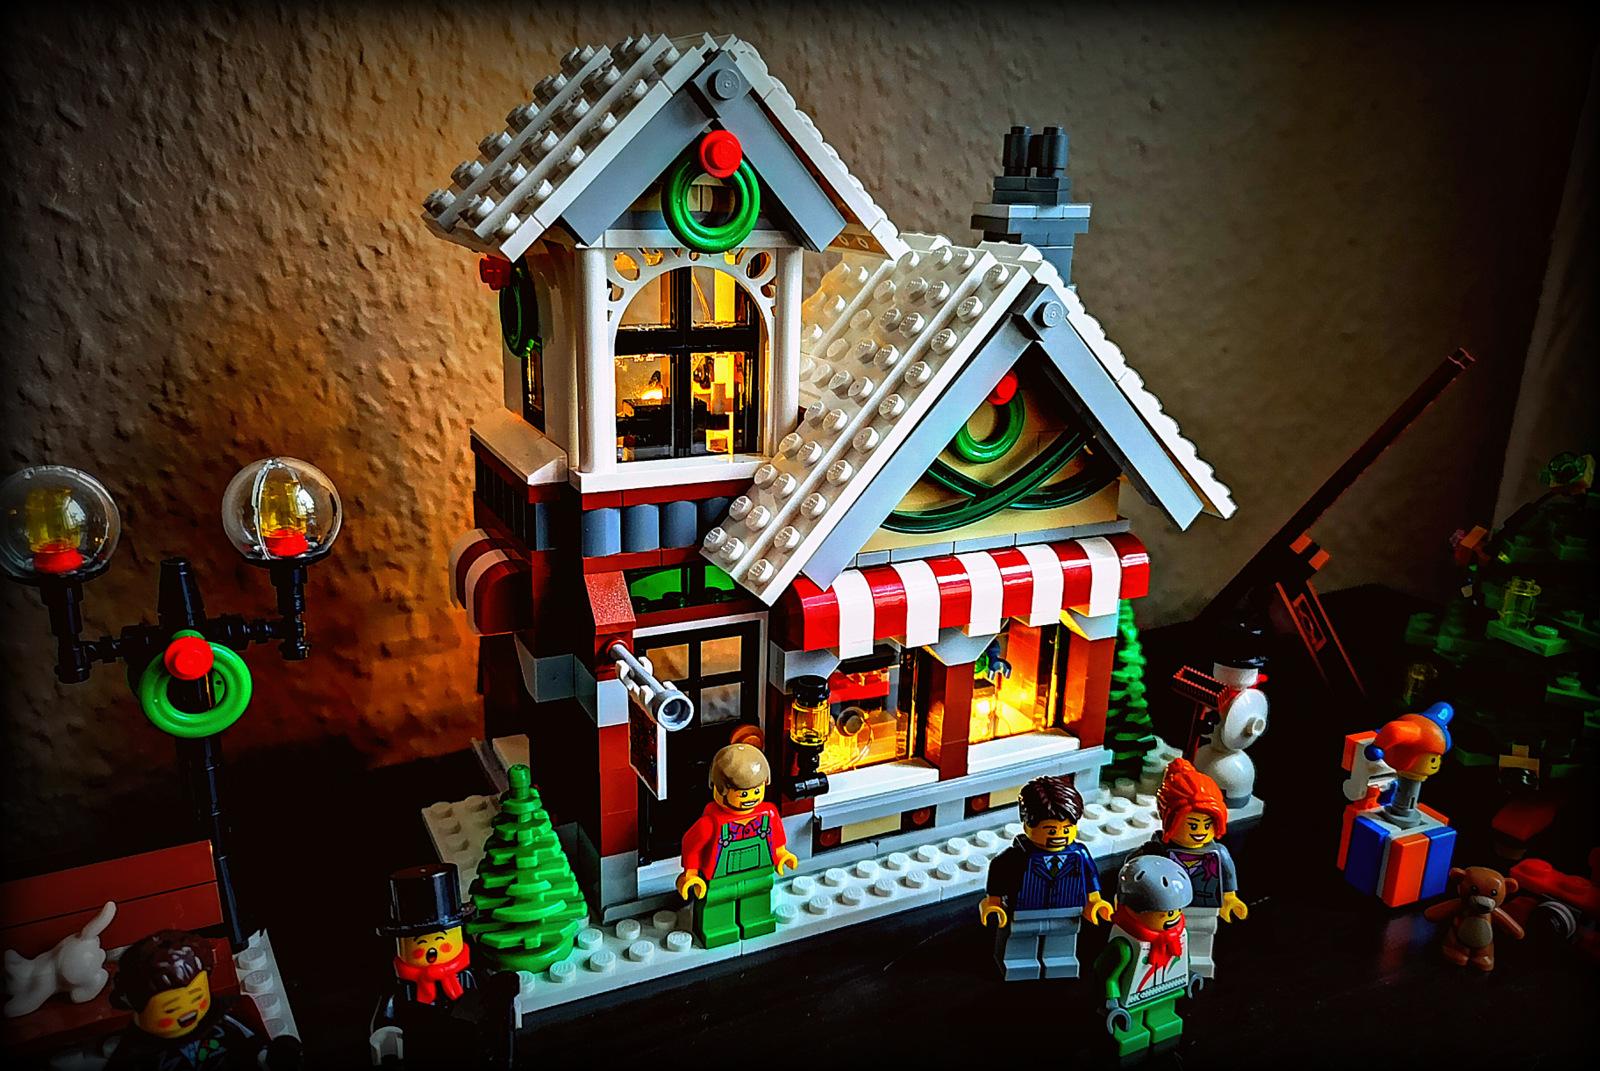 10249 LEGO Beleuchtung selber bauen